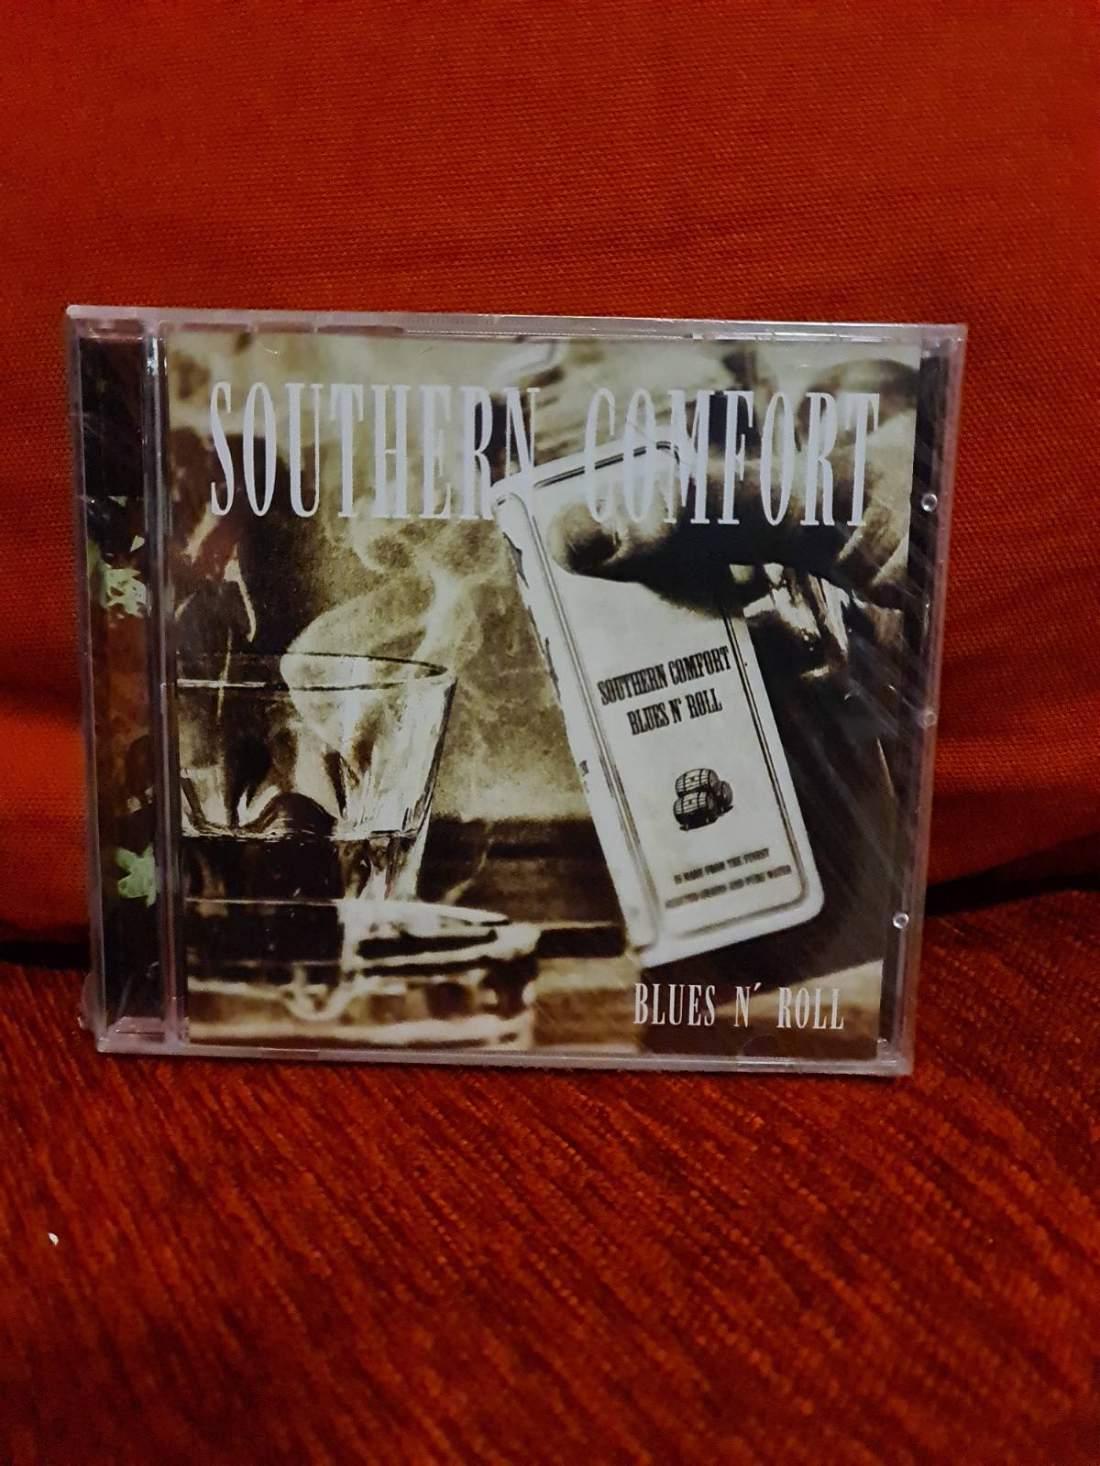 SOUTHERN COMFORT - BLUES N ROLL CD